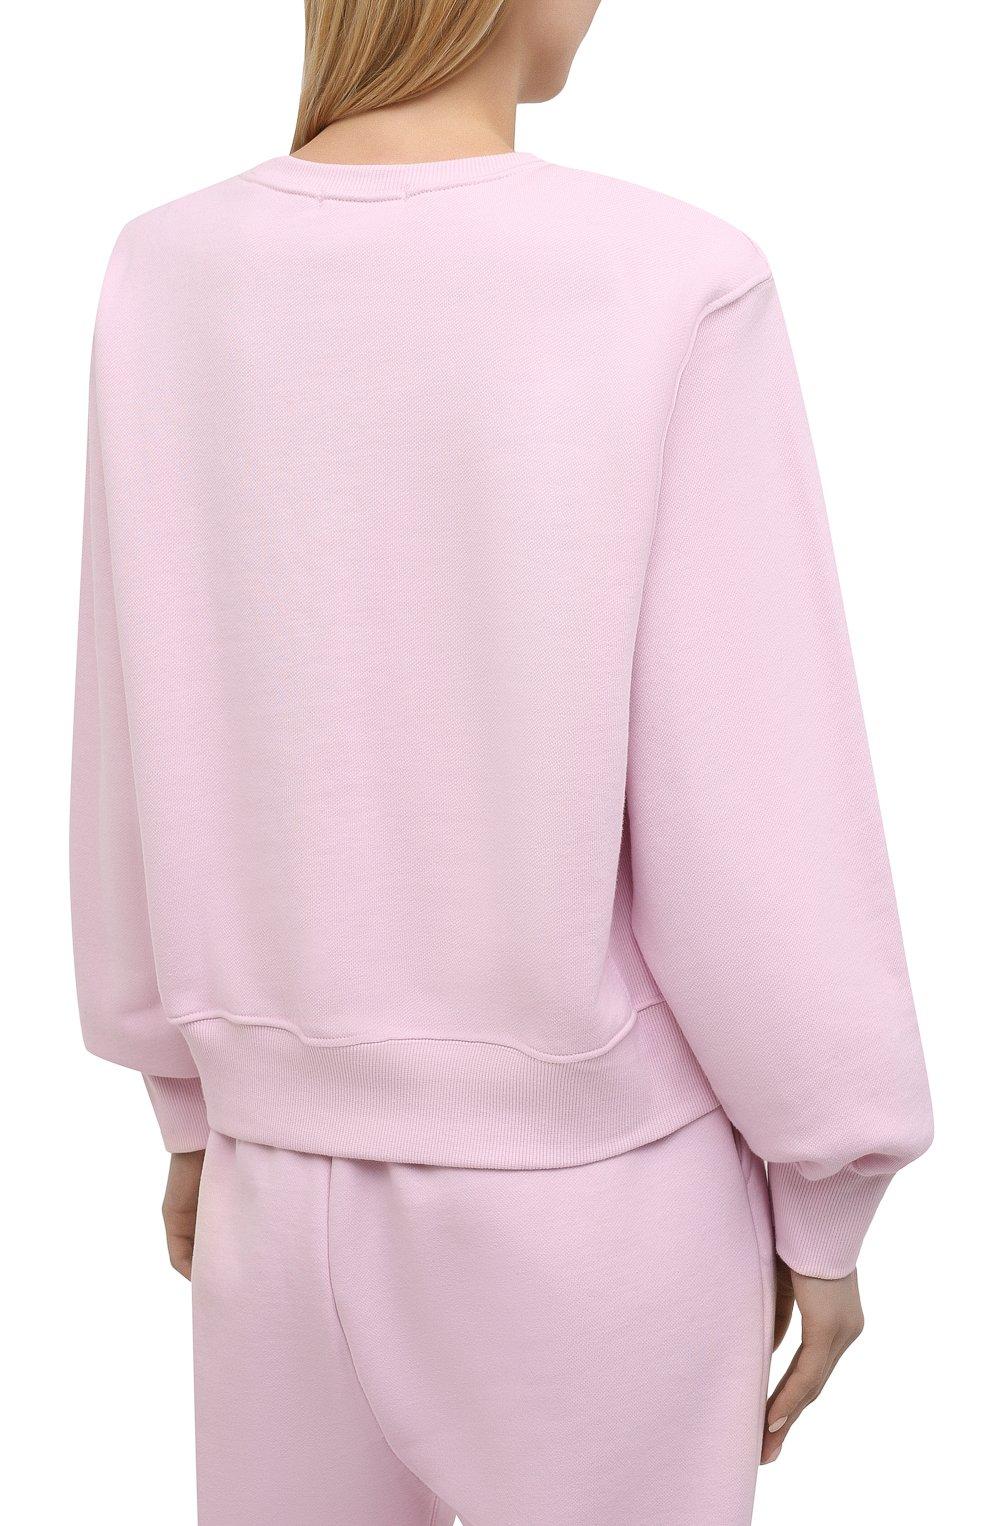 Женский хлопковый свитшот THE FRANKIE SHOP розового цвета, арт. SW VAN KR 08 | Фото 4